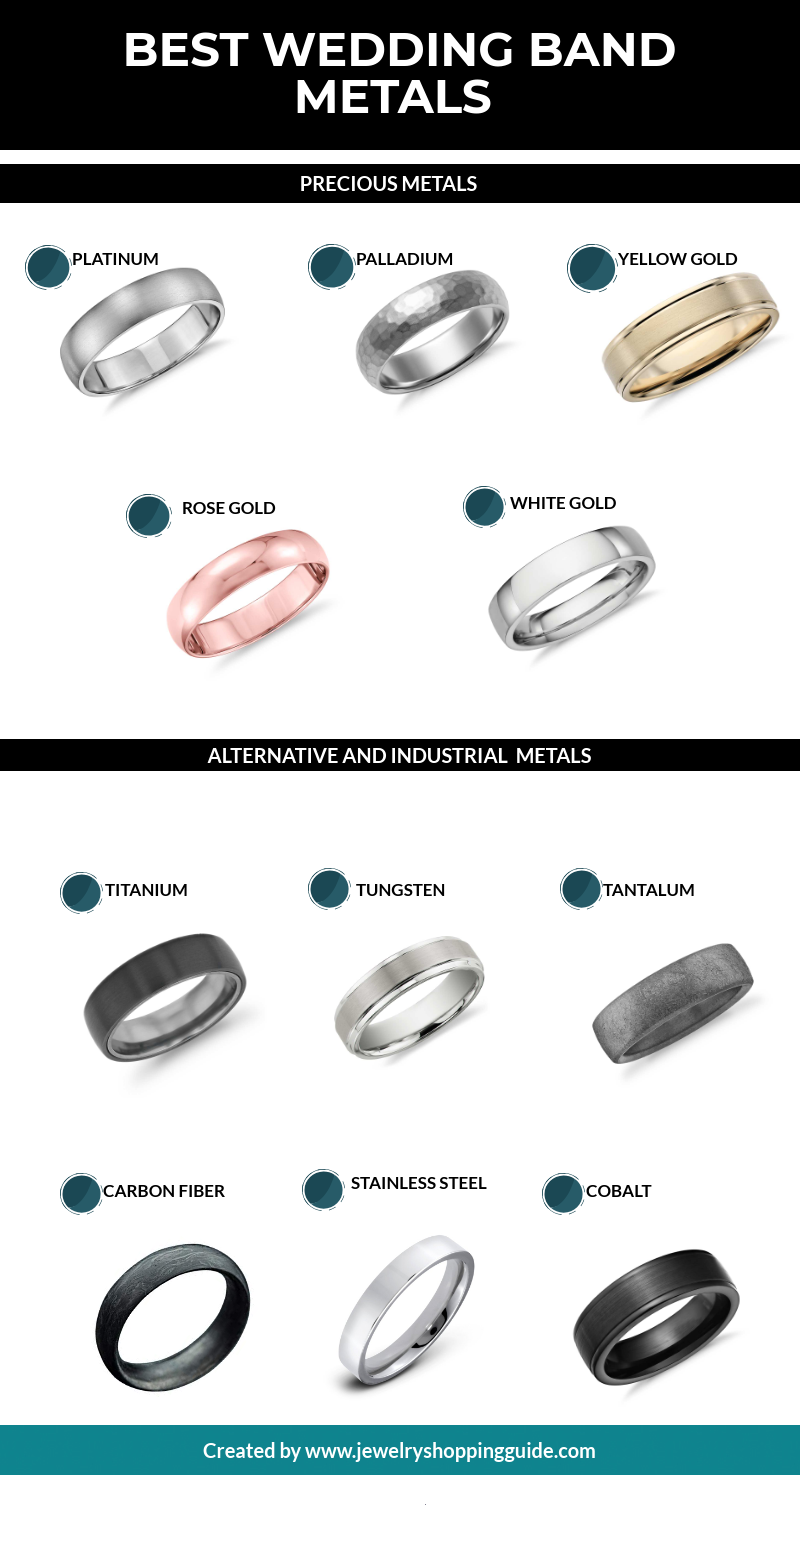 Best Wedding Band Metals Mens Wedding Rings Wedding Ring Metals Types Of Wedding Rings